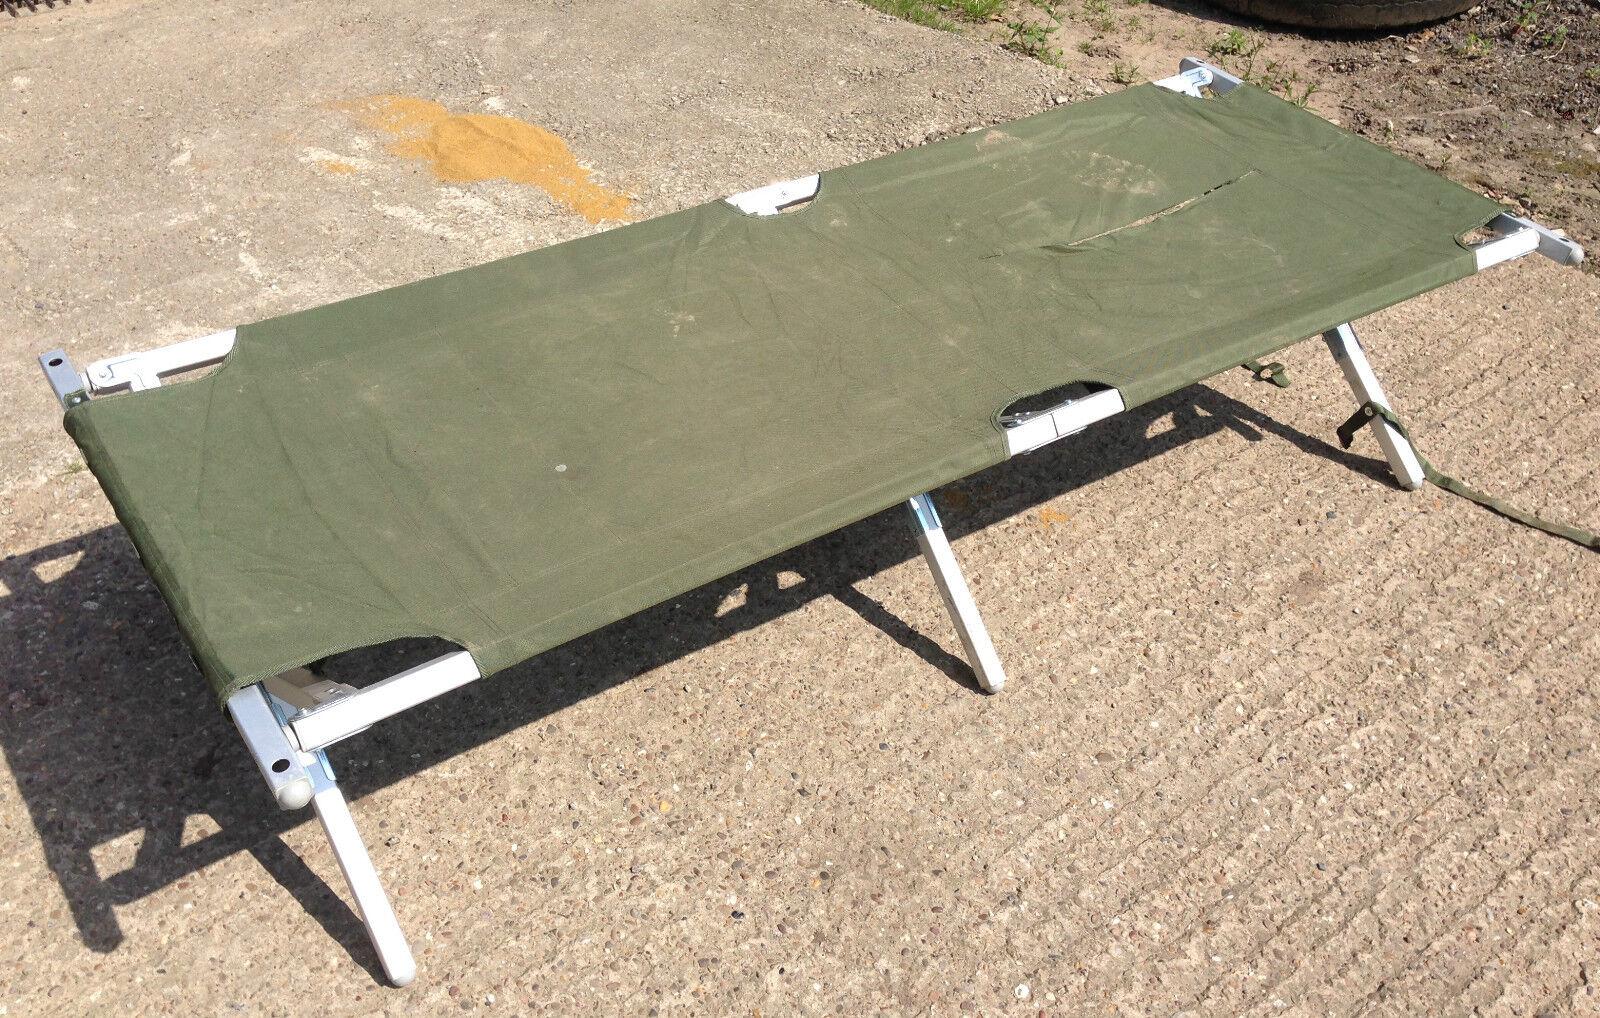 British Army Heavy Duty Aluminium Folding Camp Bed Latest Issue DAMAGED COVER!!